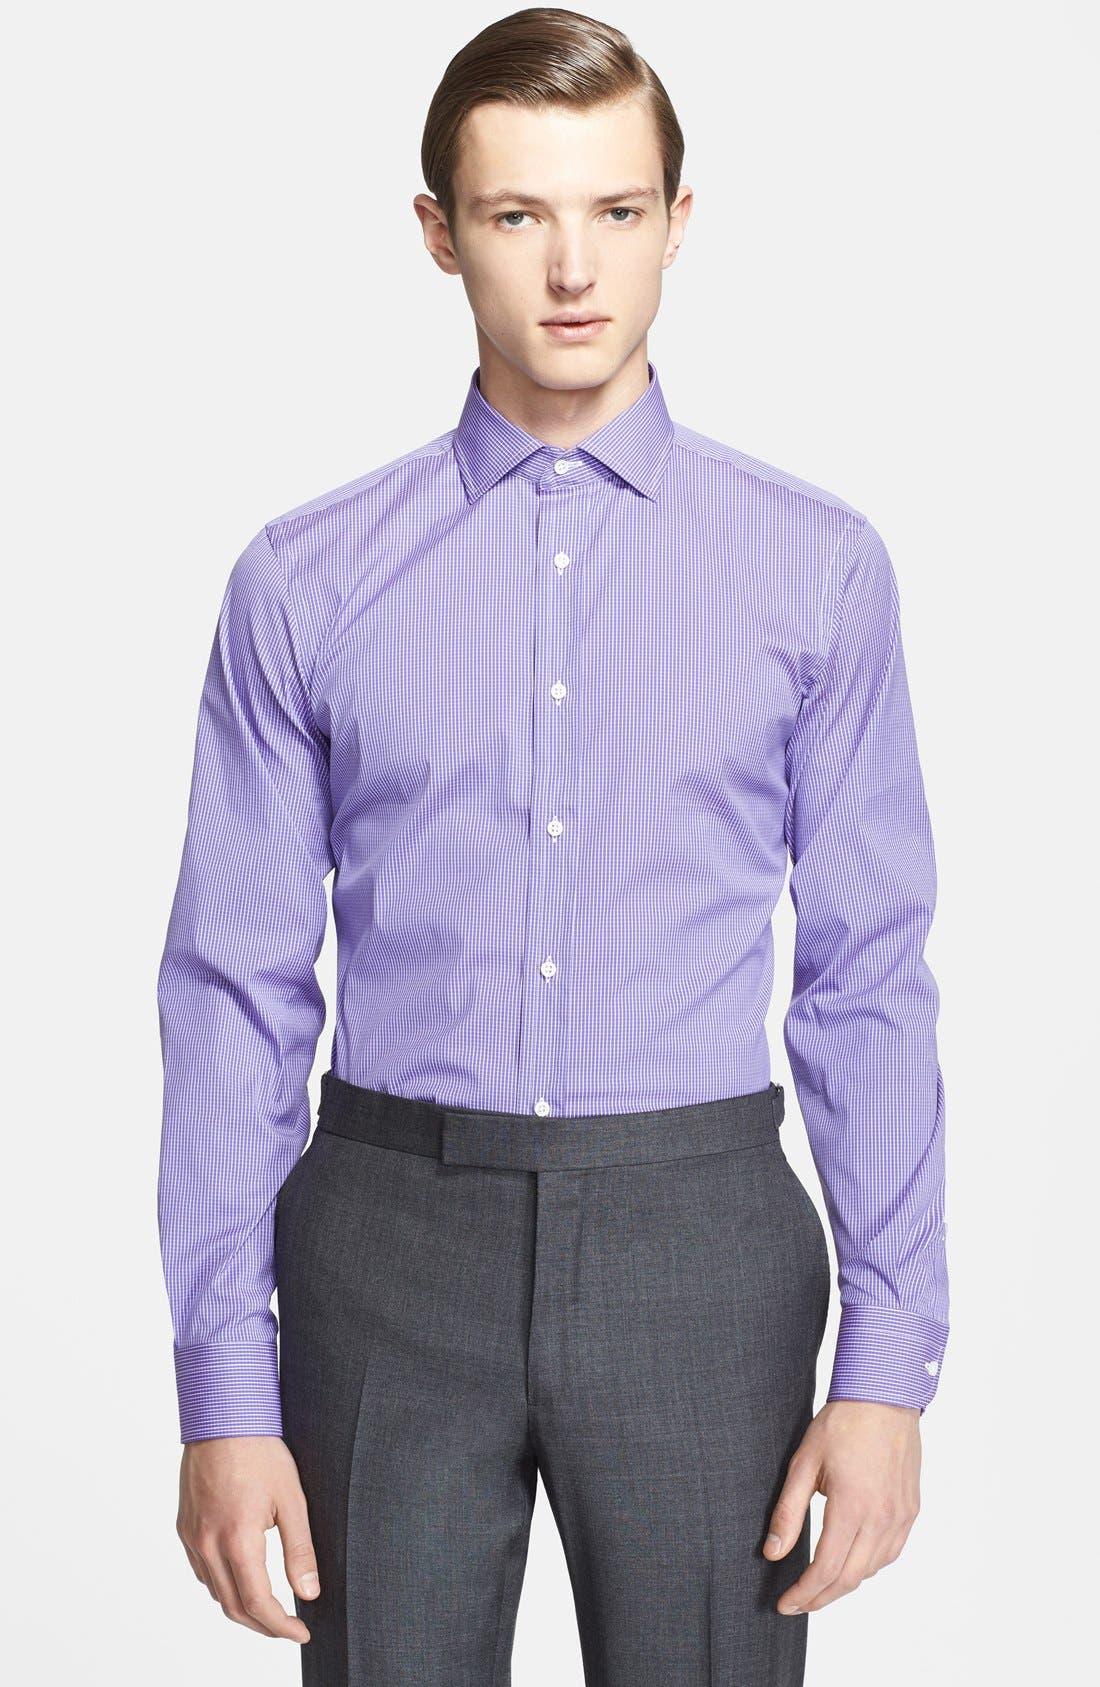 Main Image - Ralph Lauren Black Label Trim Fit Stripe Dress Shirt